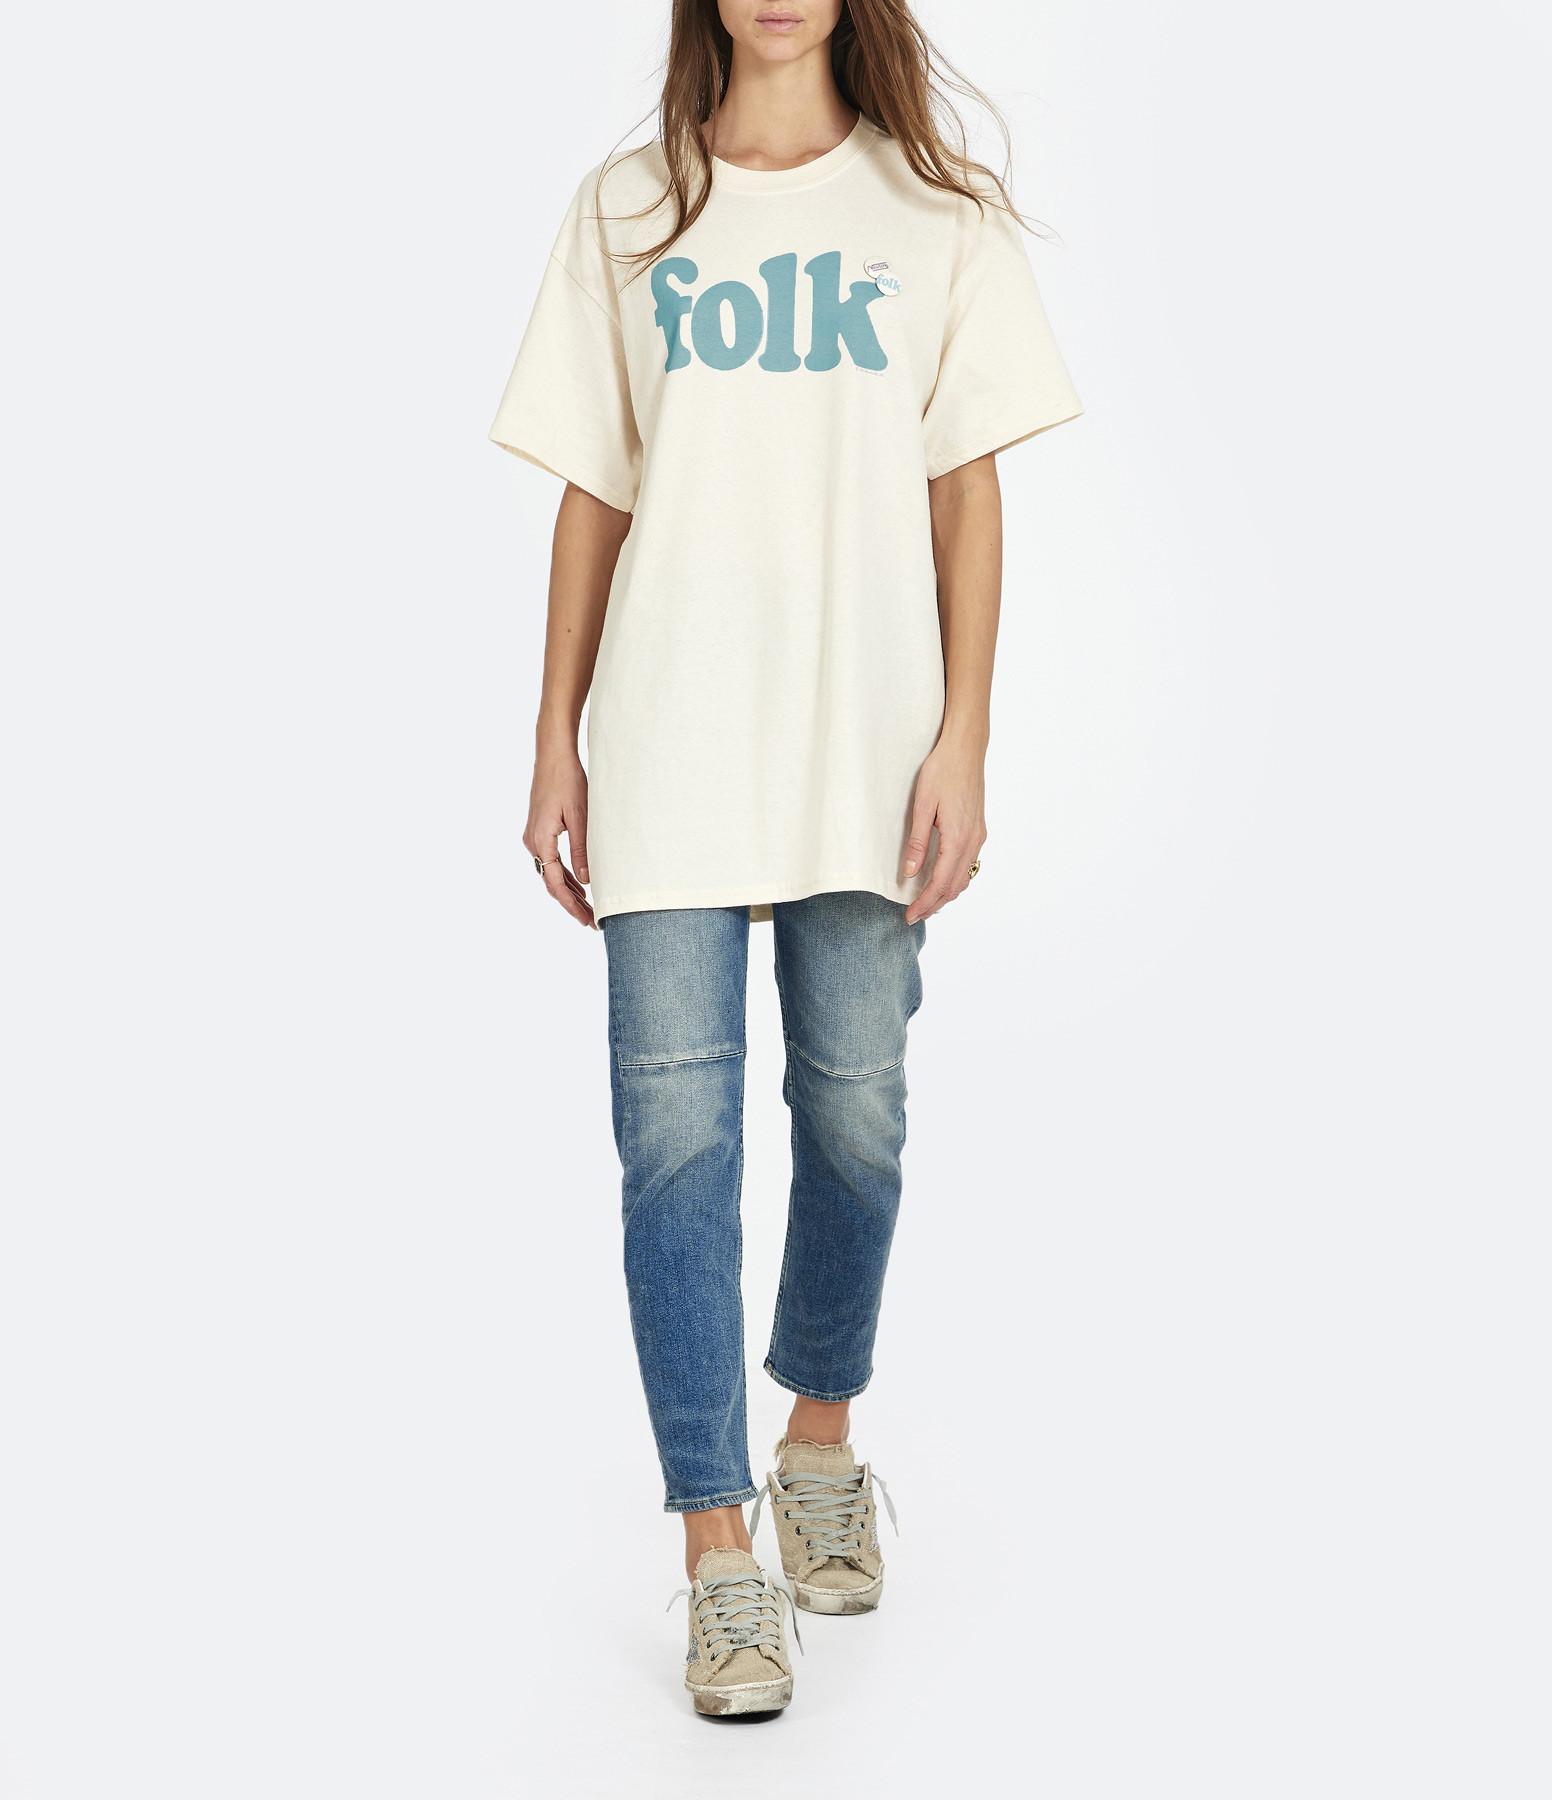 NEWTONE - Tee-shirt Folk Naturel